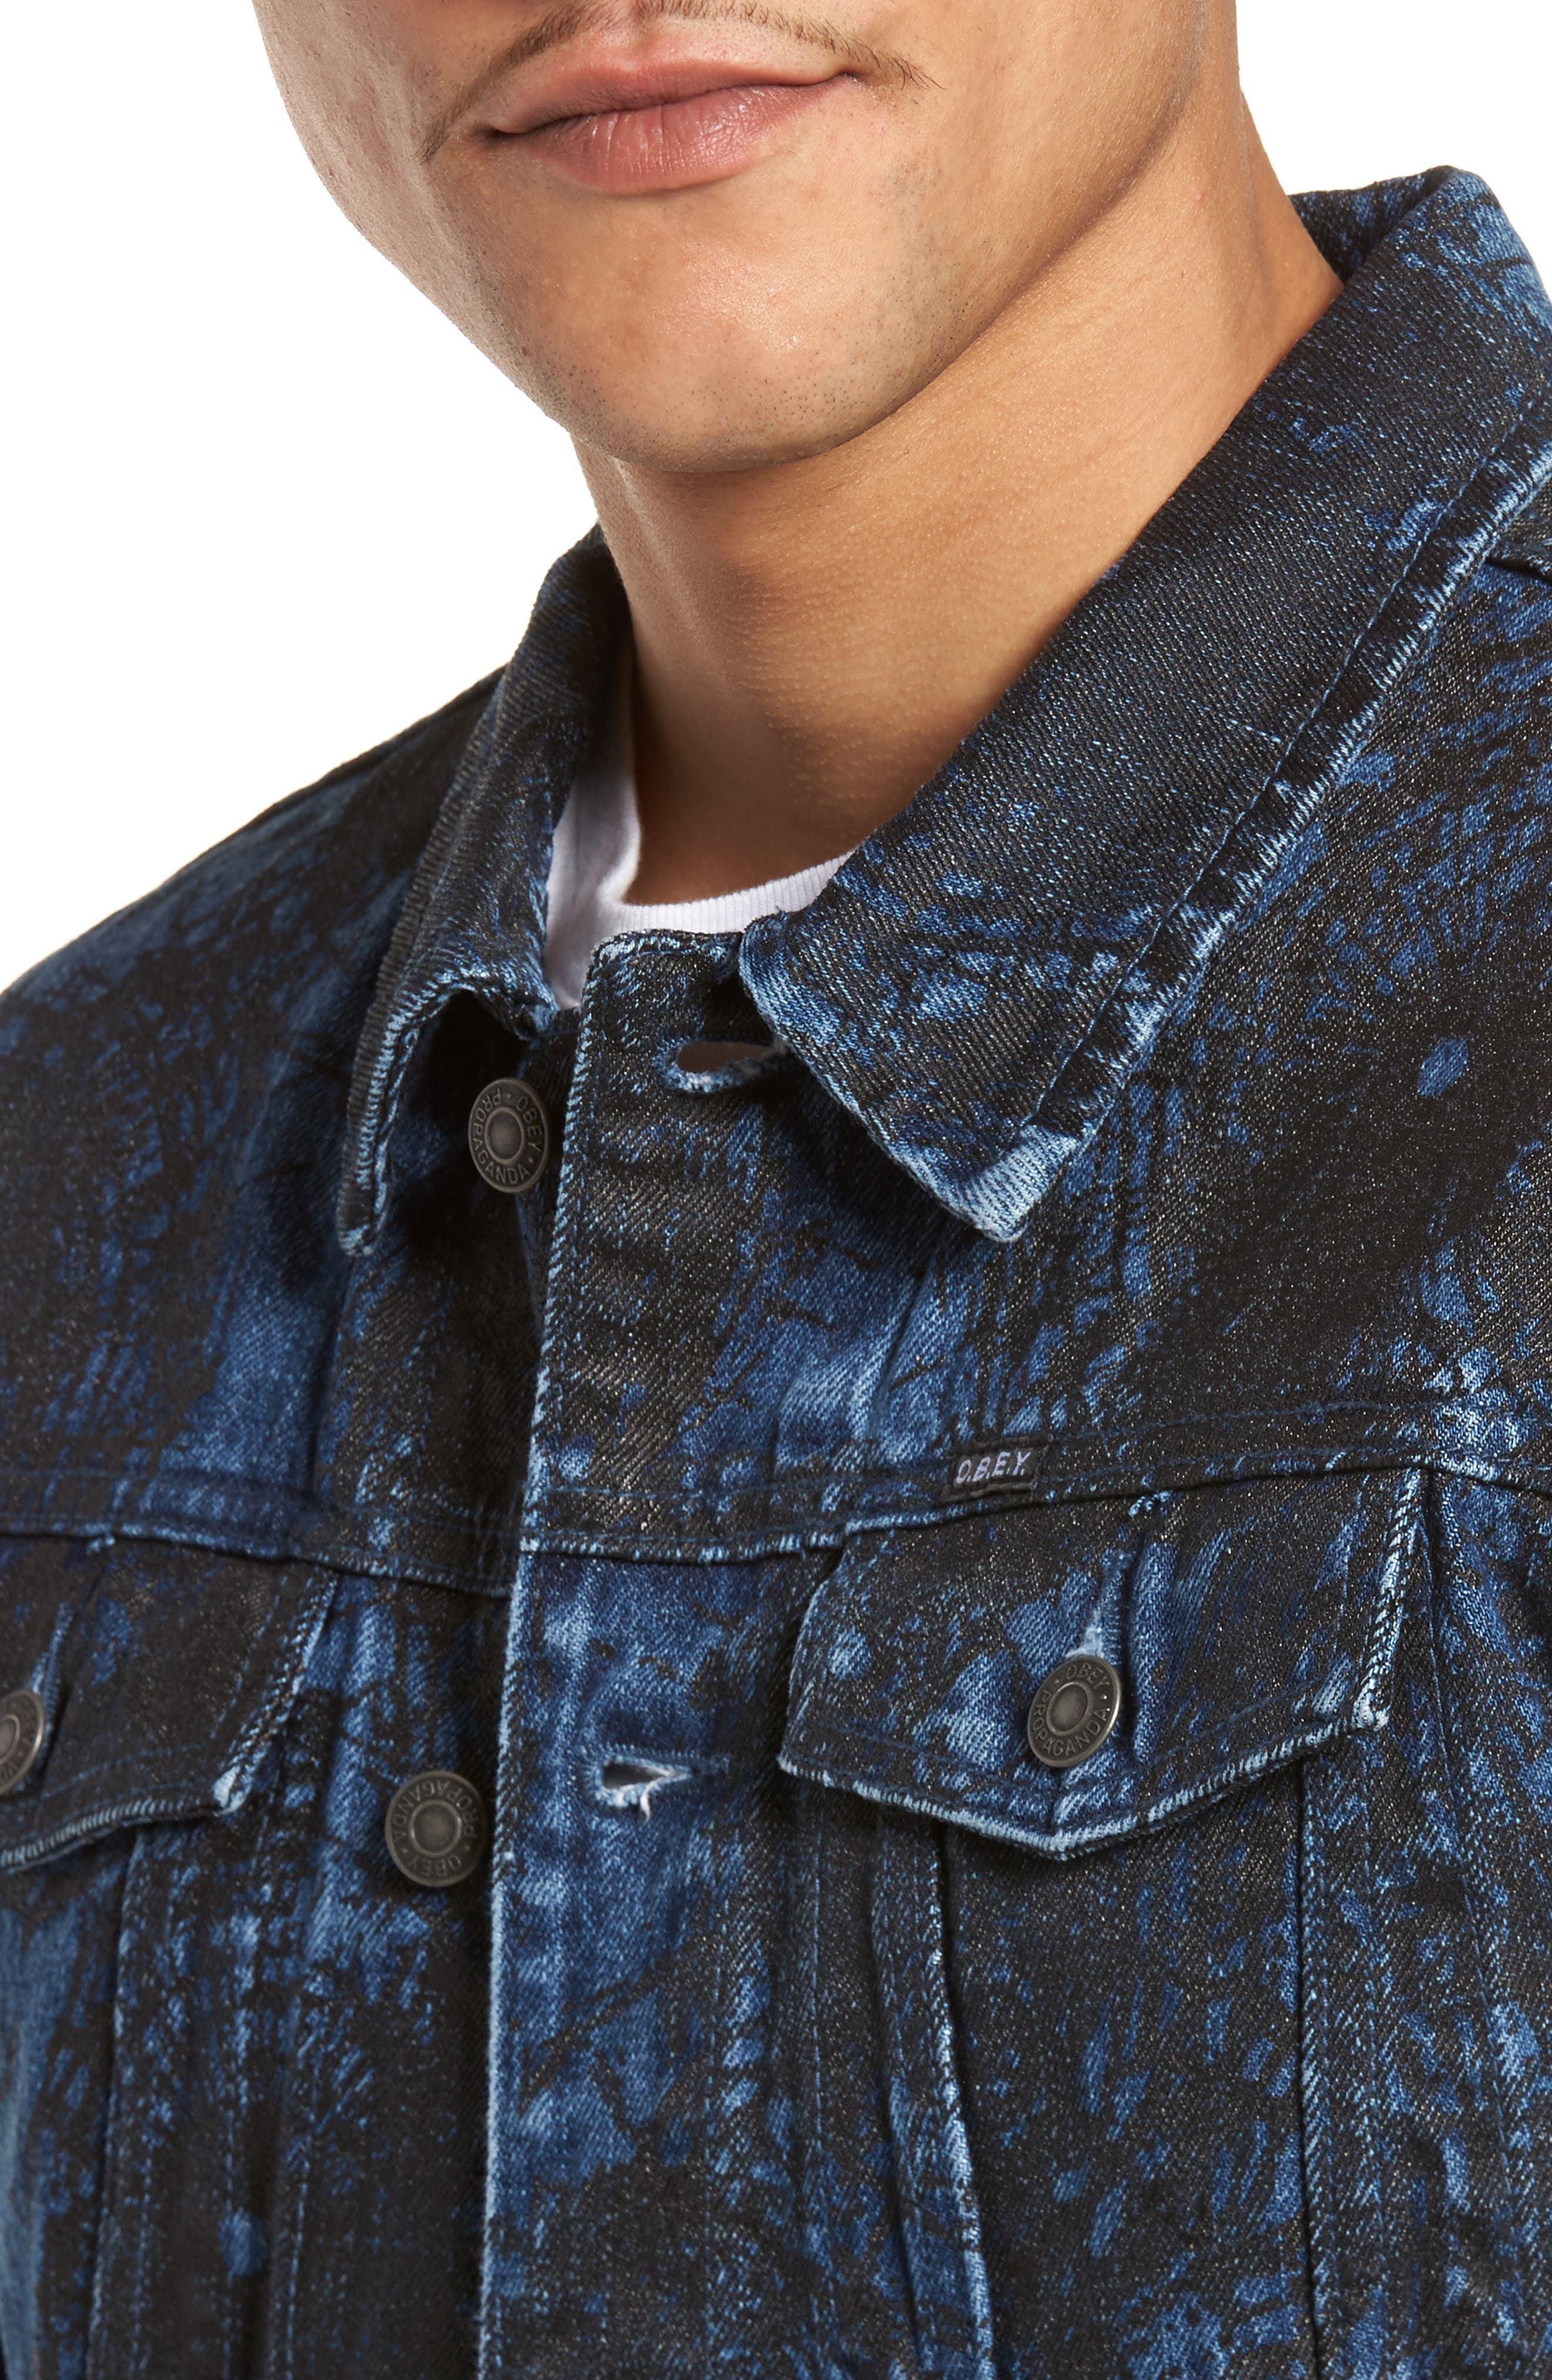 Shattered Denim Jacket,                             Alternate thumbnail 4, color,                             002